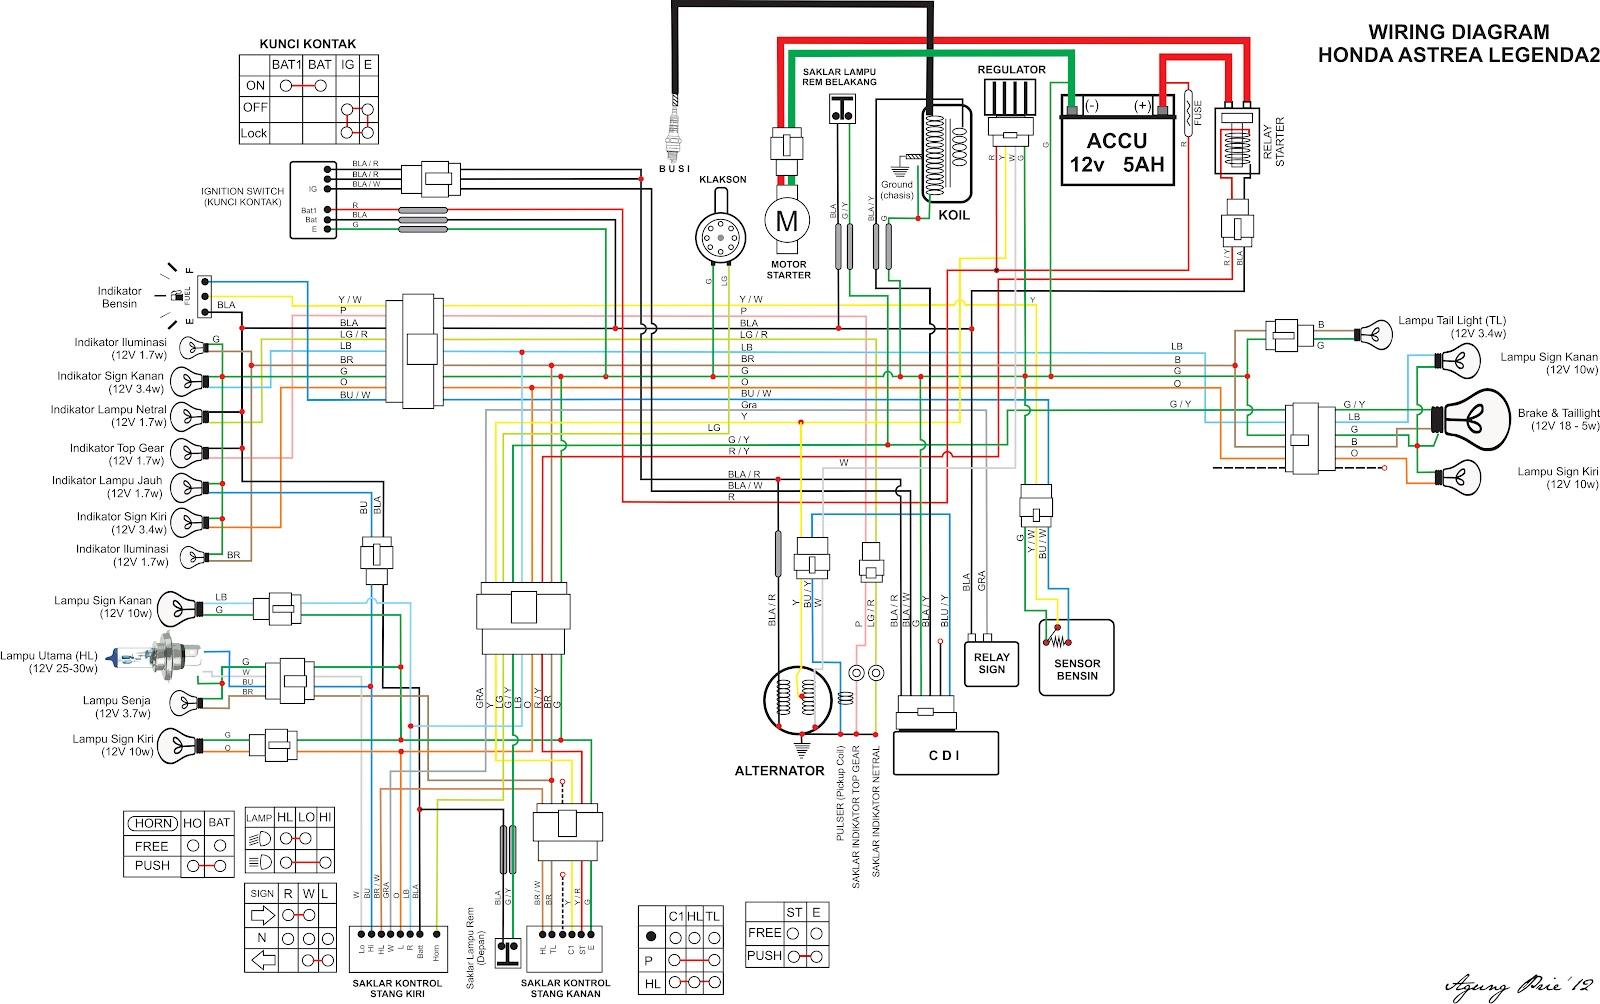 Tsm Smkn Sukoharjo Blog Wiring Diagram Rangkaian Kabel Kelistrikan Sepeda Motor